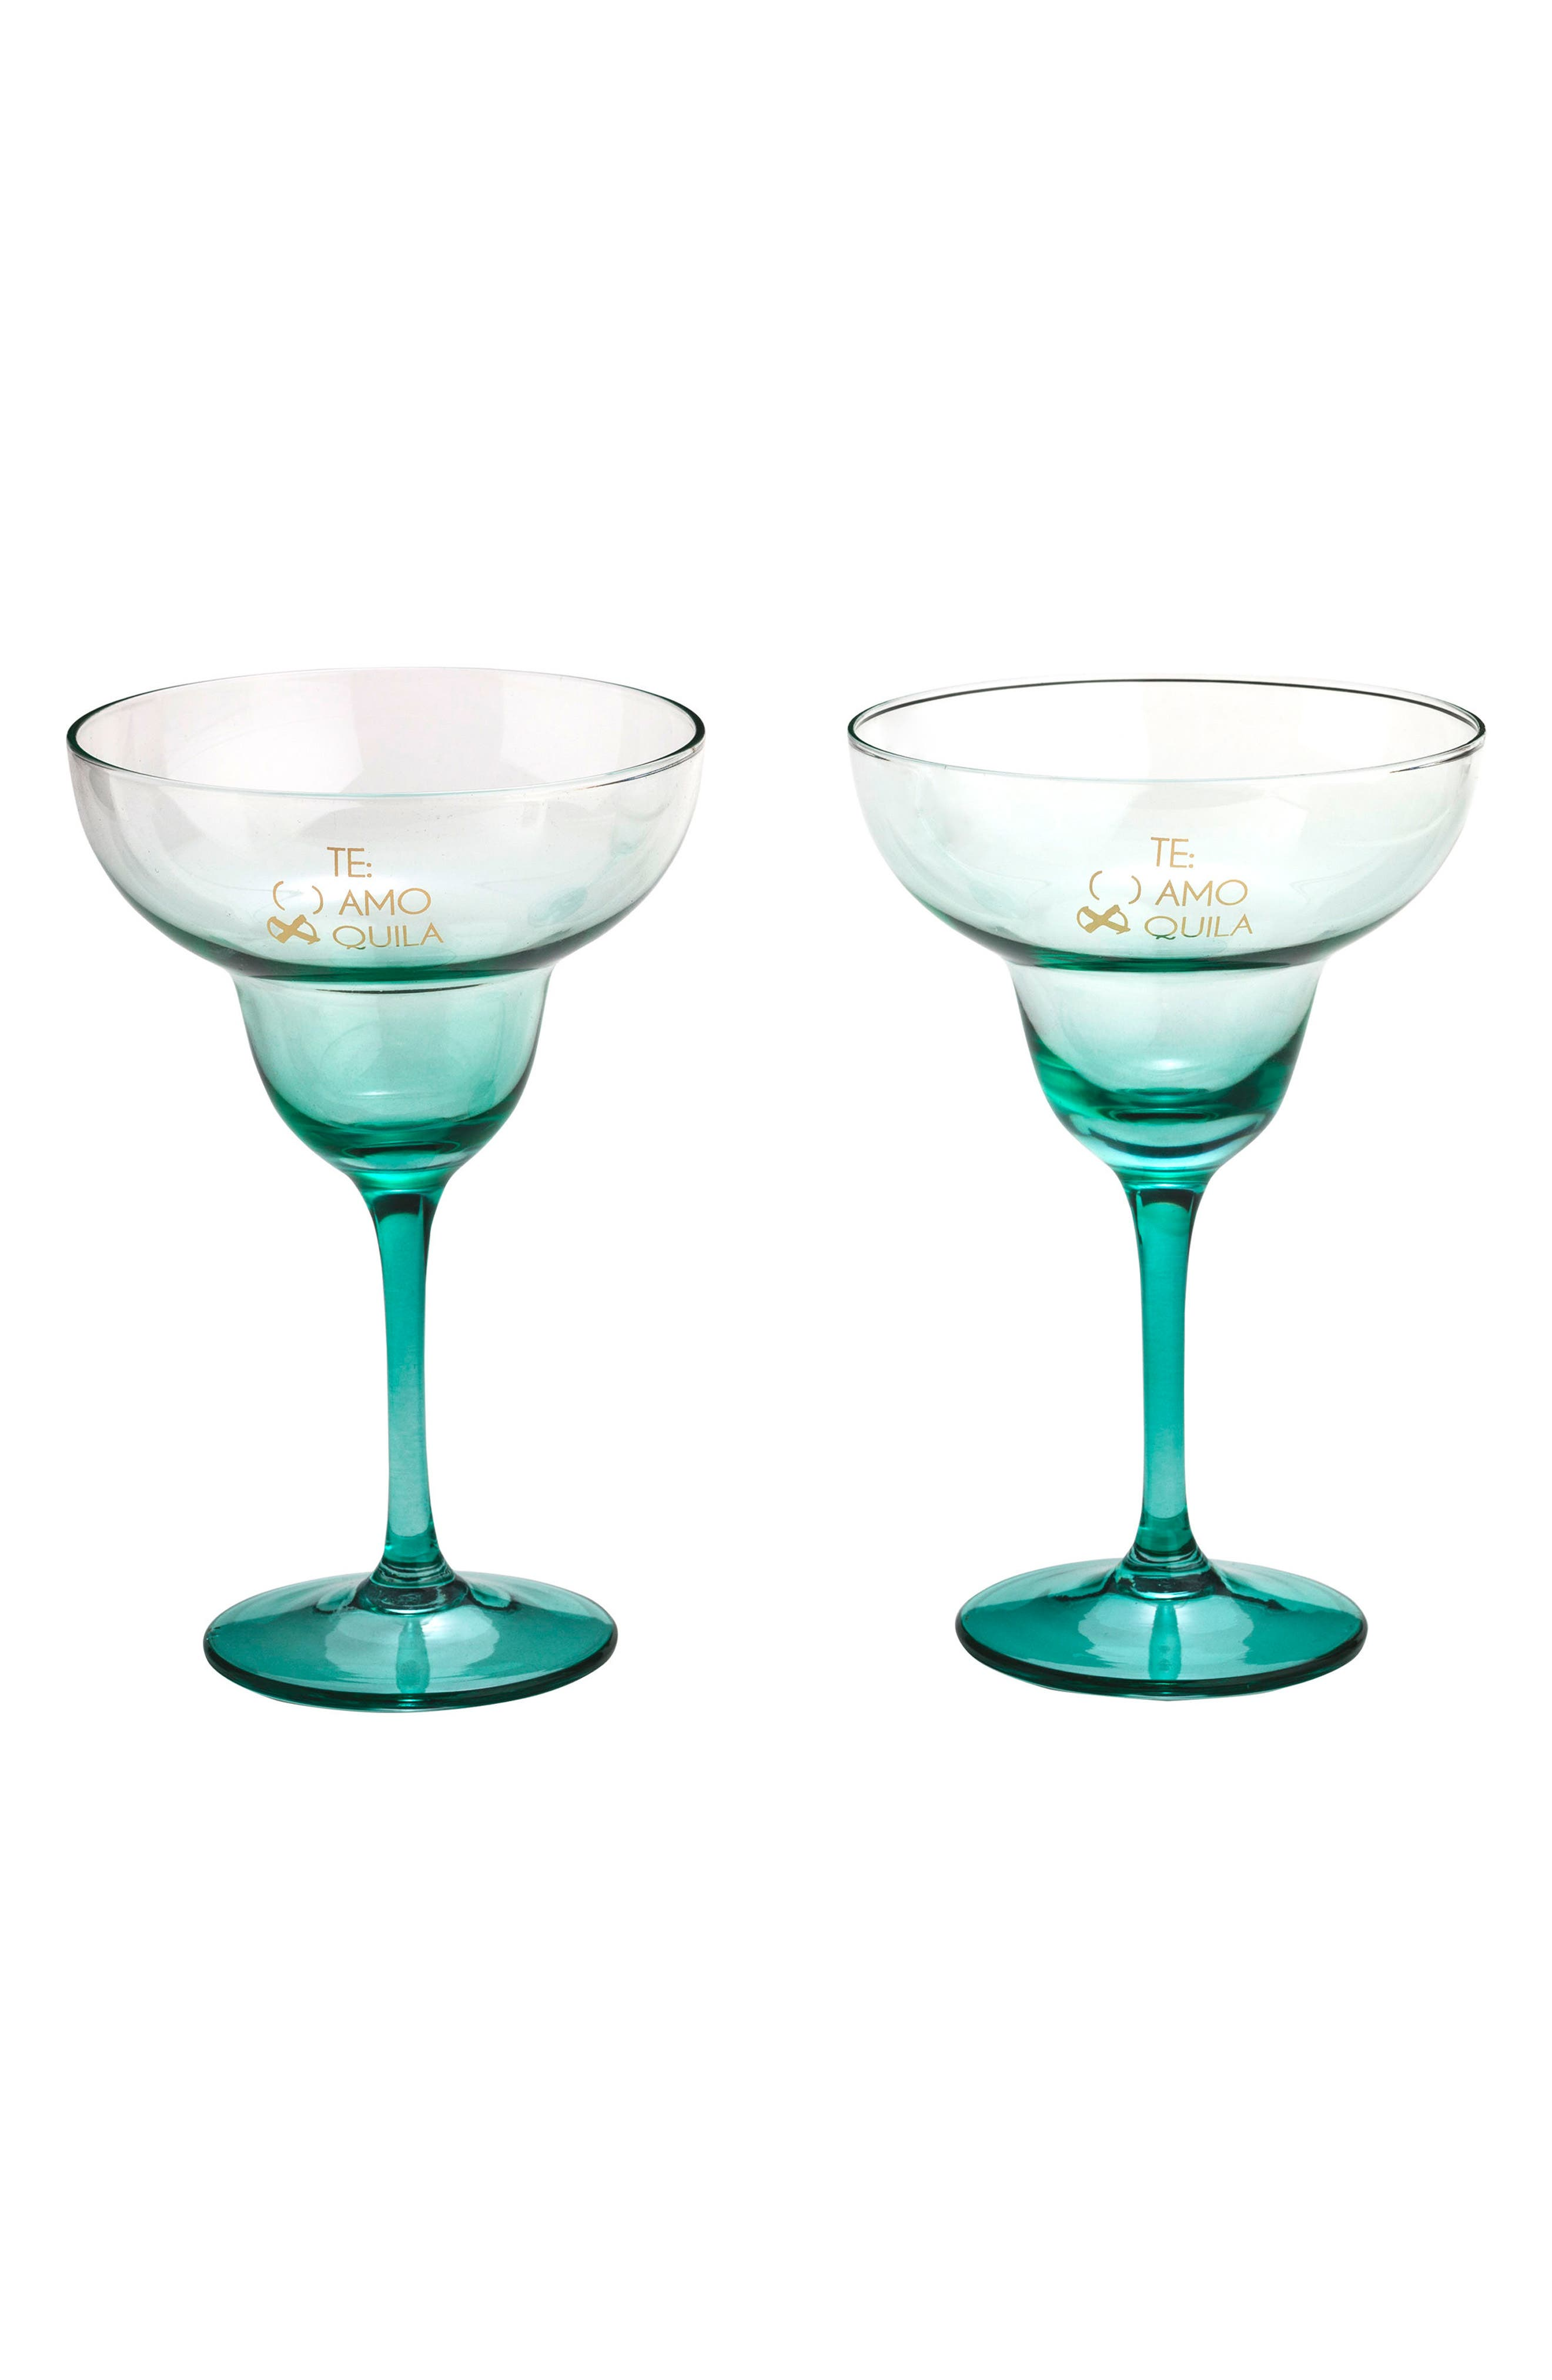 Te Amo x Quila Set of 2 Margarita Glasses,                             Main thumbnail 1, color,                             Glass/ Gold